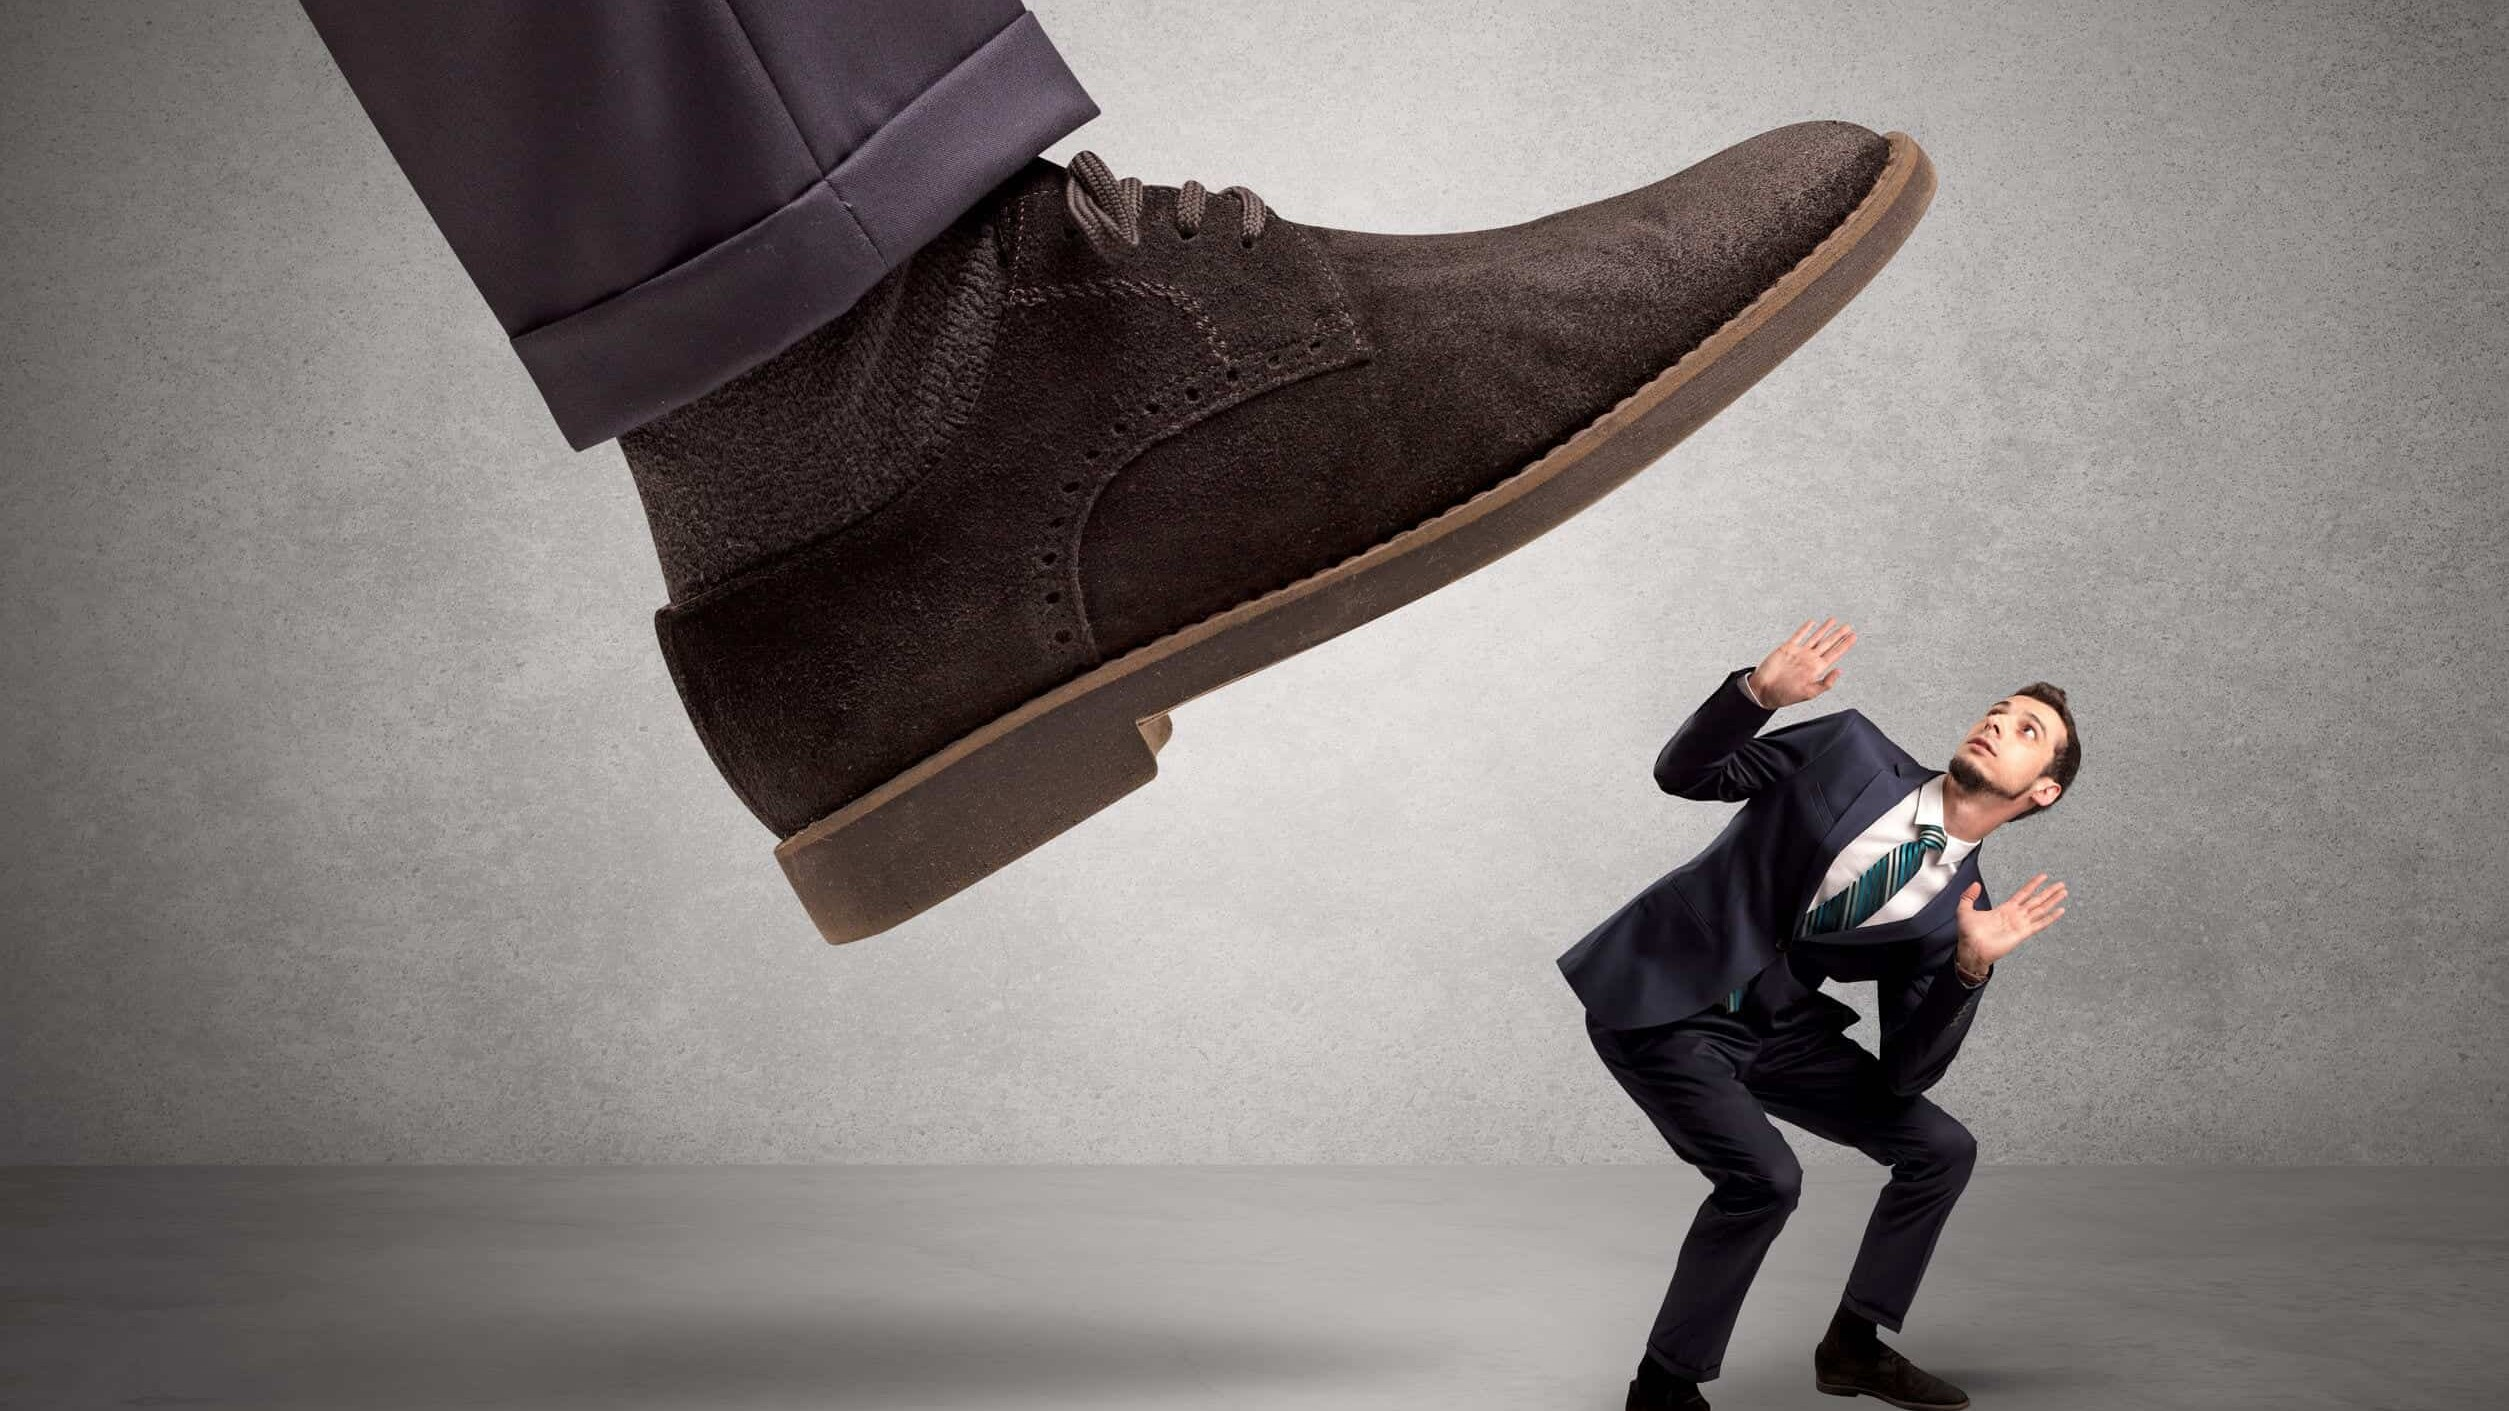 Help Me Fix My Boss - Overbearing